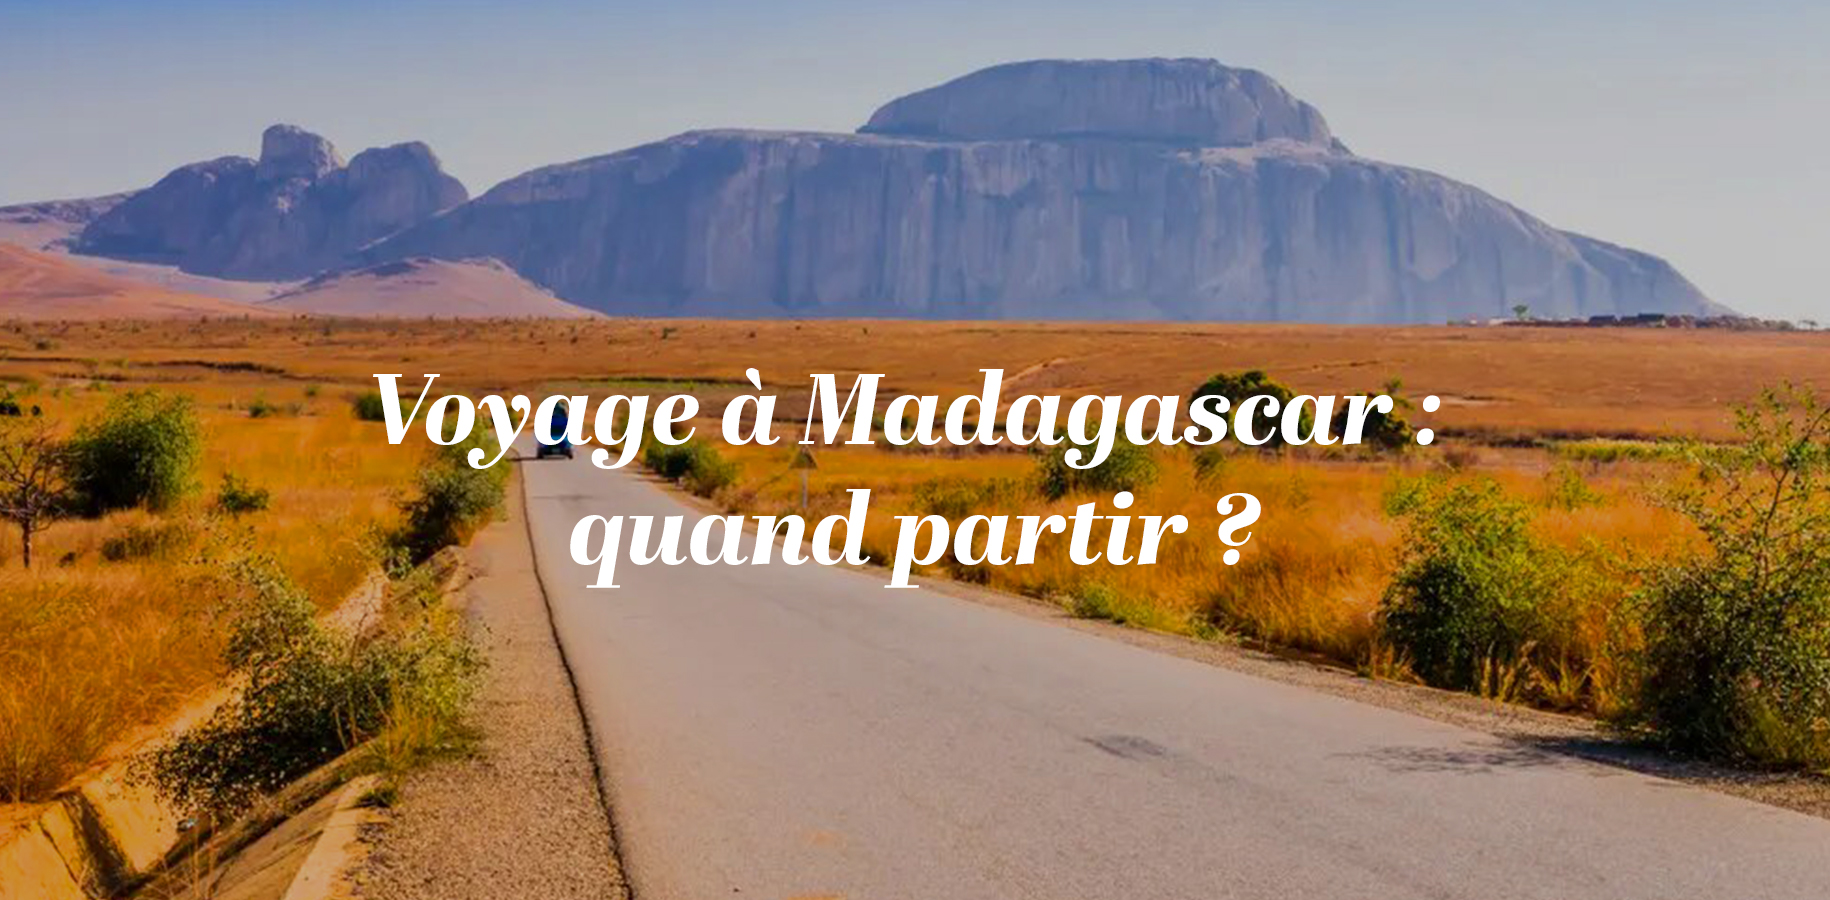 Voyage à Madagascar : quand partir?